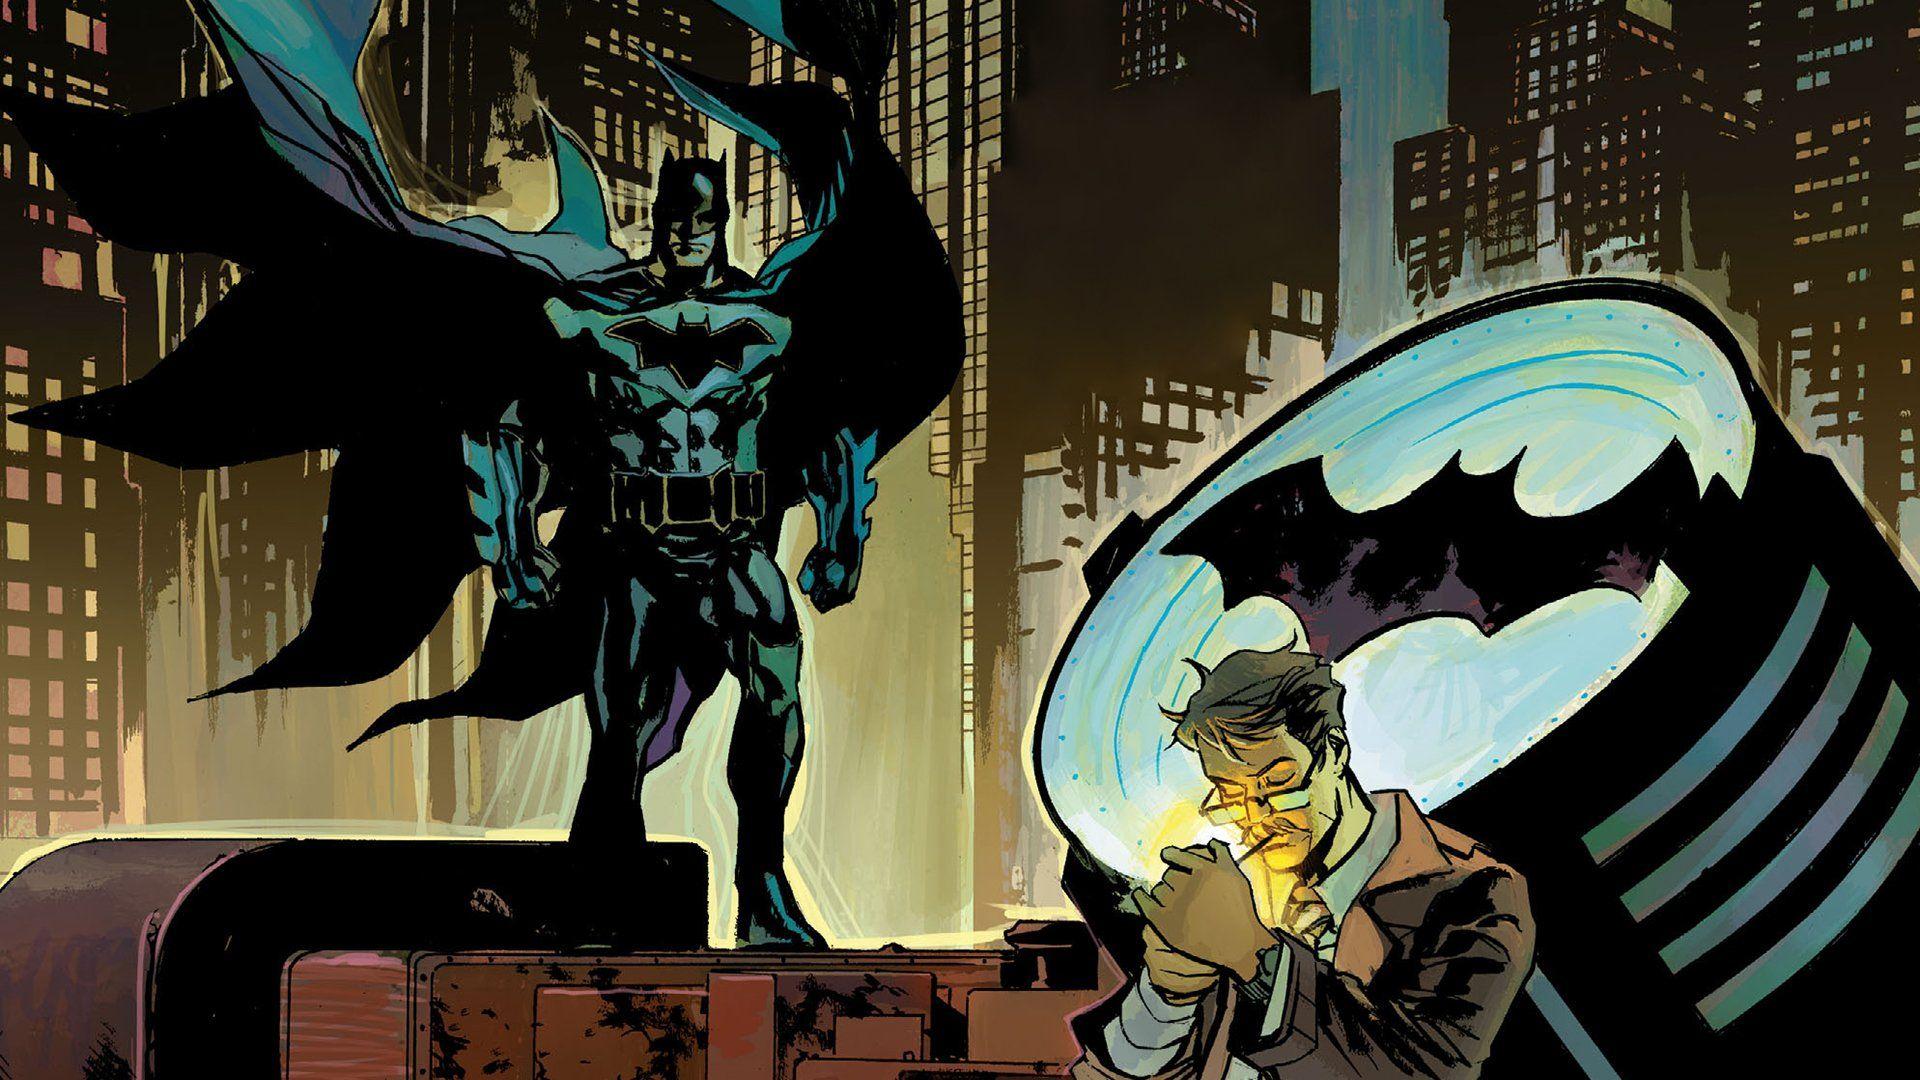 Psychology of Bruce Wayne 53694e3498d0c83d6a43d69bcd85e38e